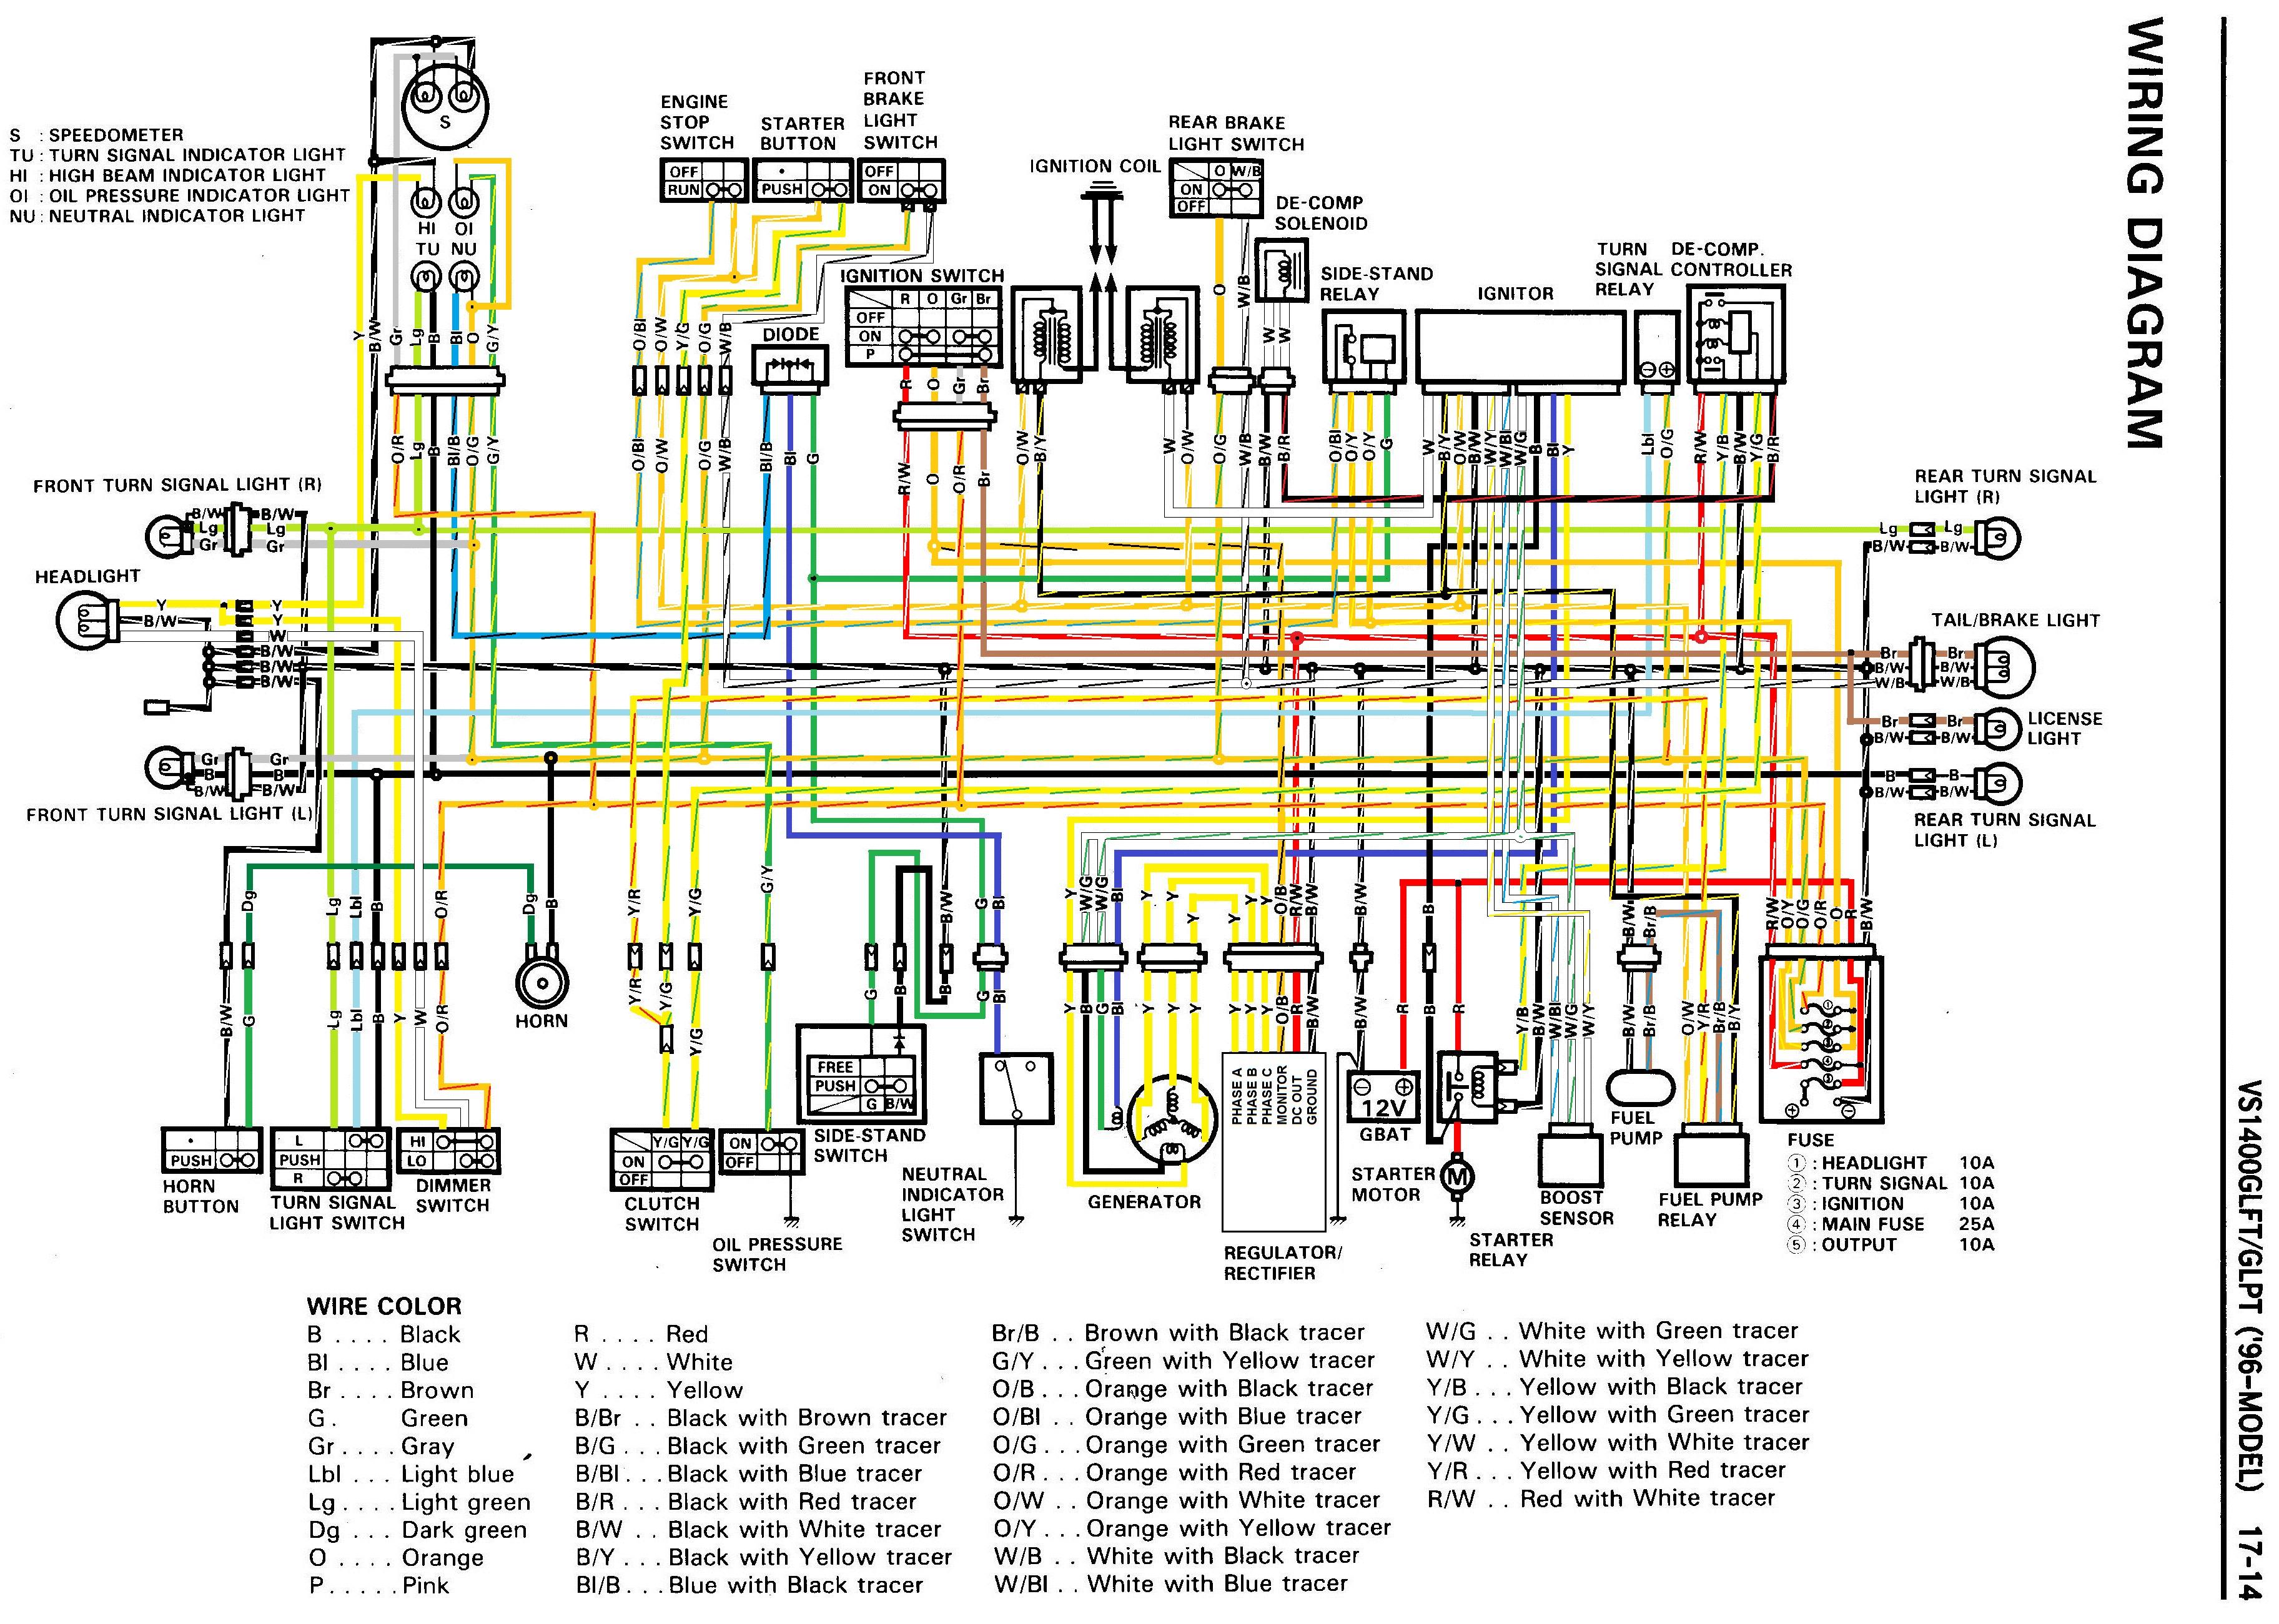 Swell 4440 Wiring Diagram Better Wiring Diagram Online Wiring Cloud Dulfrecoveryedborg